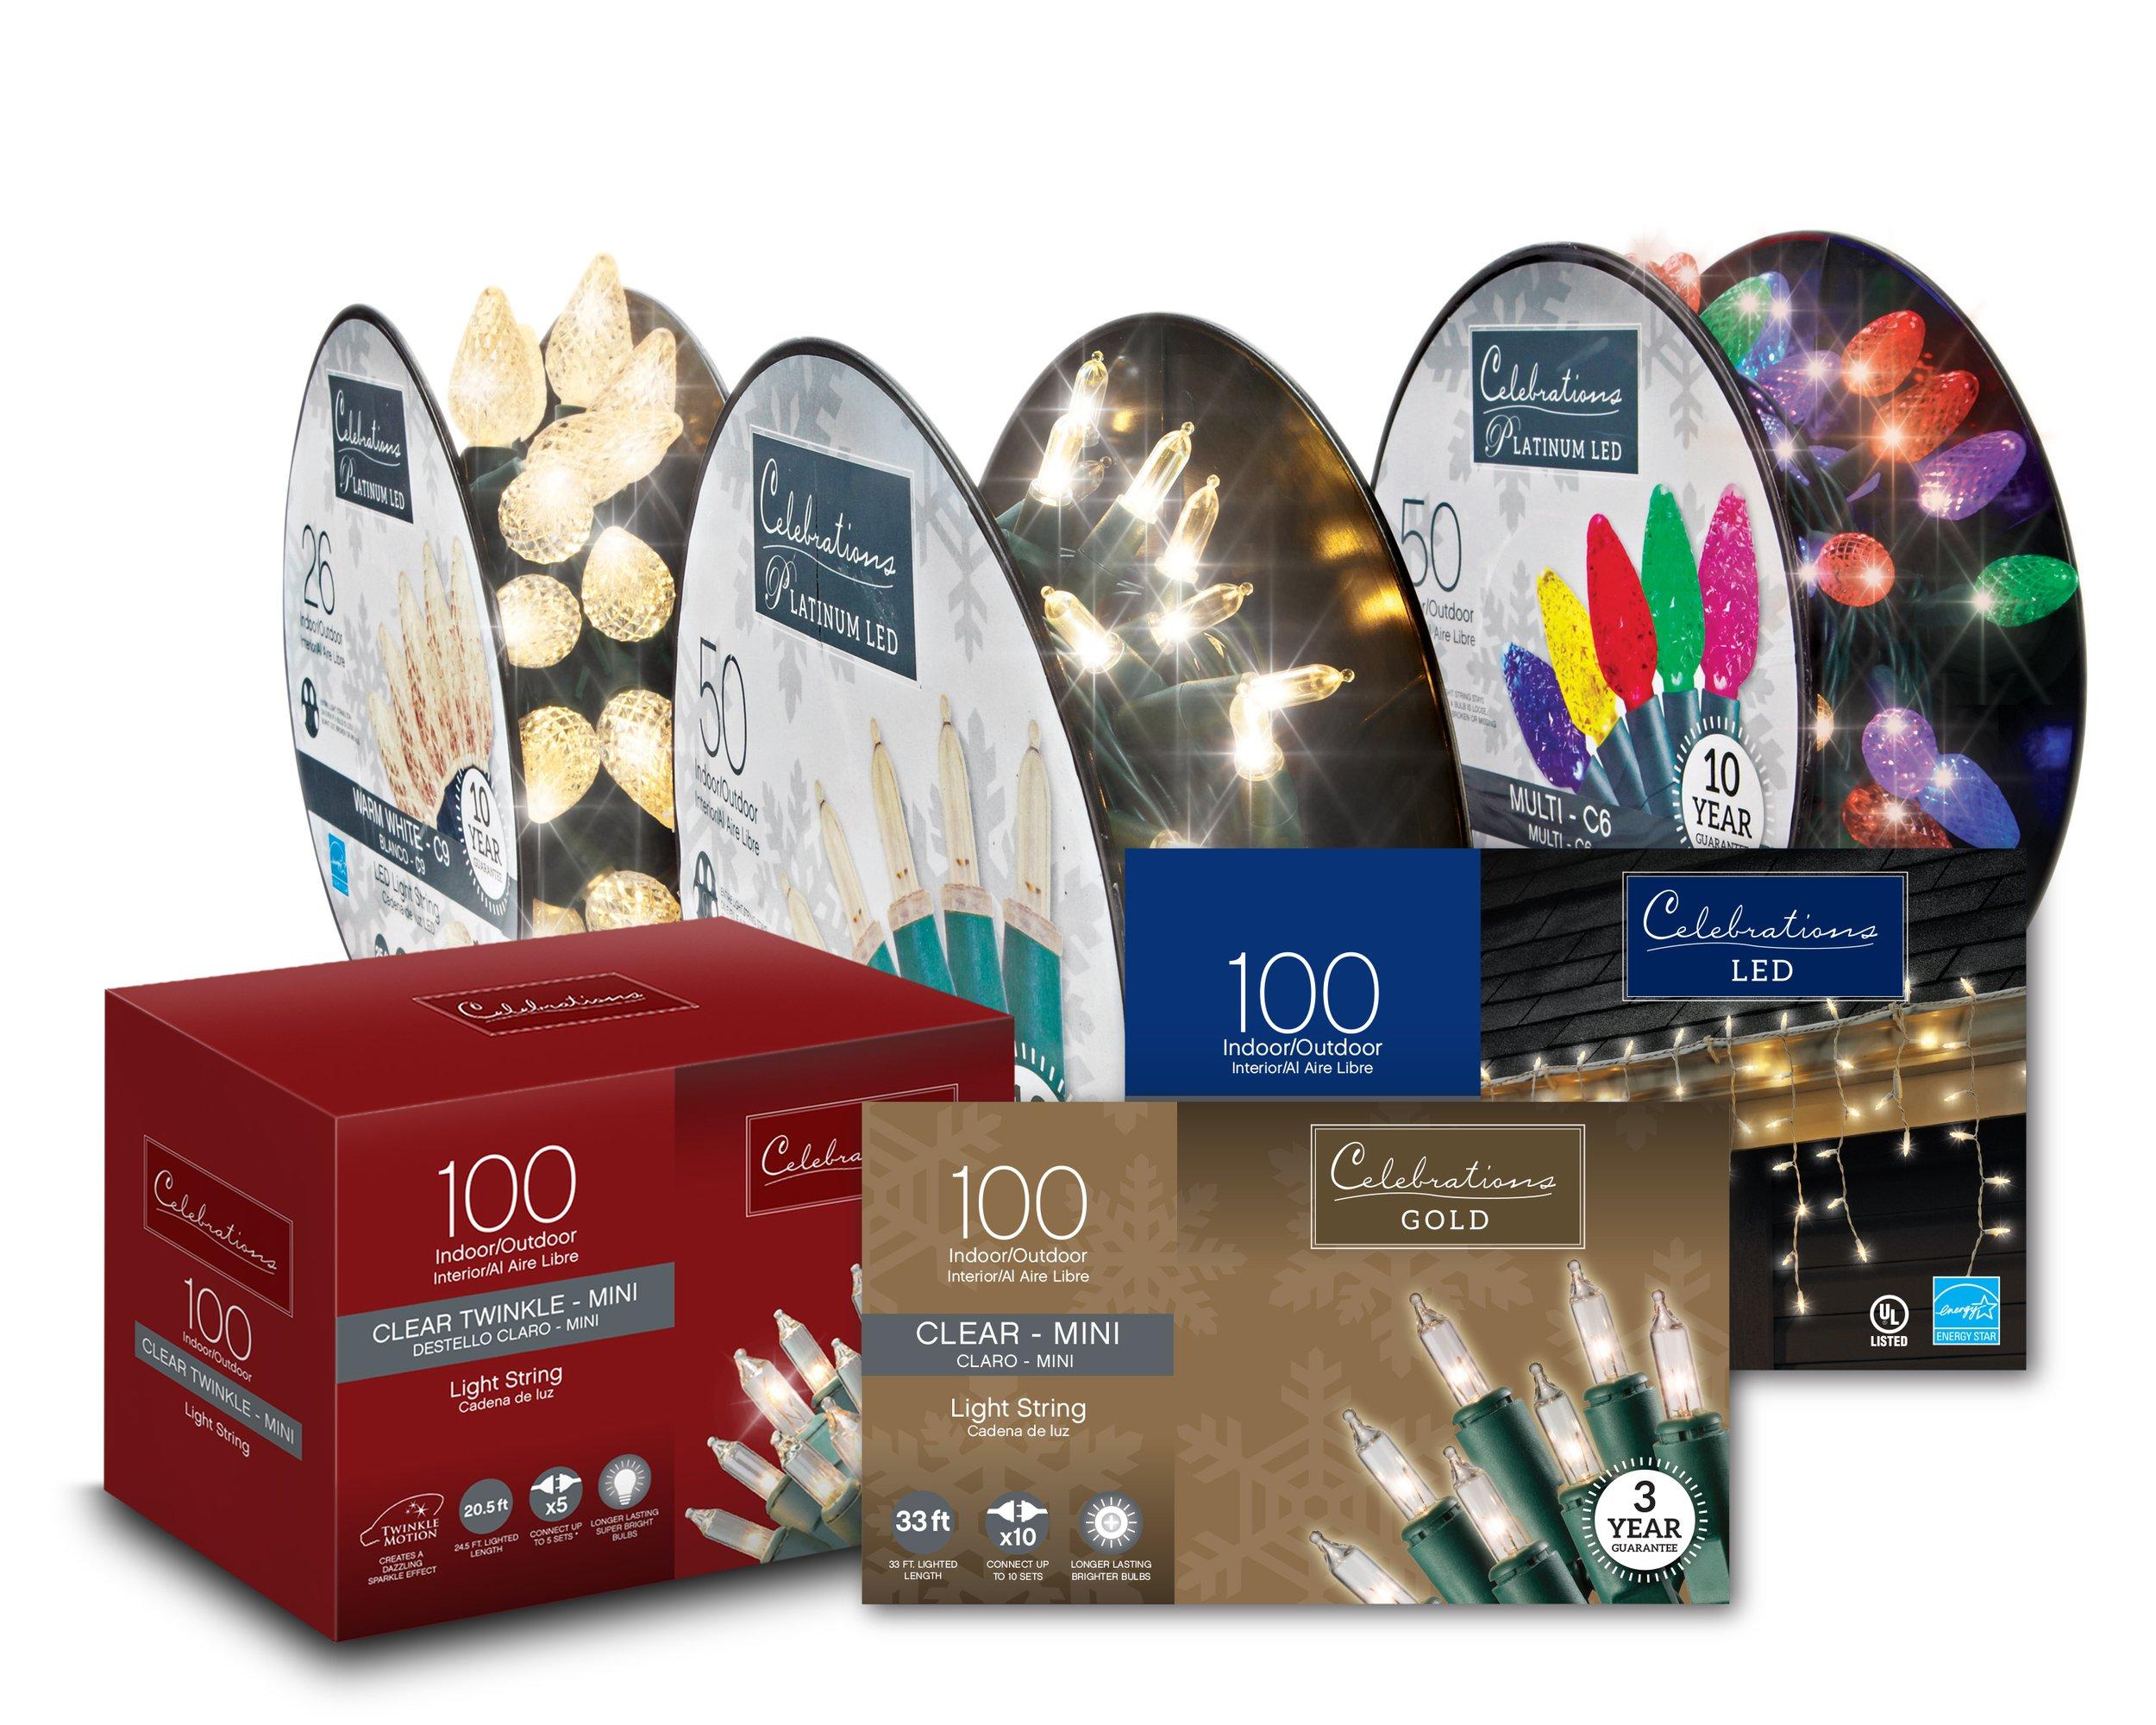 assortment of Celebrations holiday lights